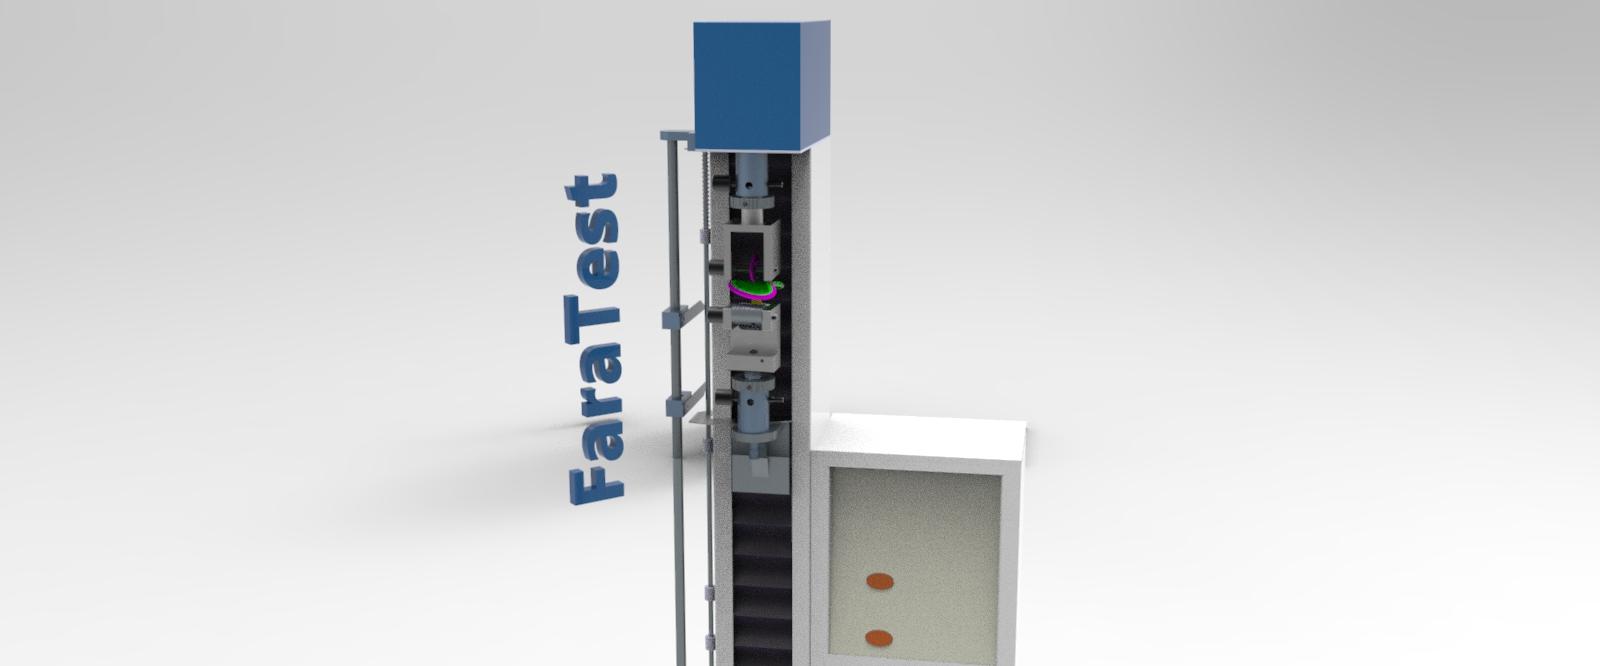 Soother Test Equipment Per Bs En 1400 2 Tensomax